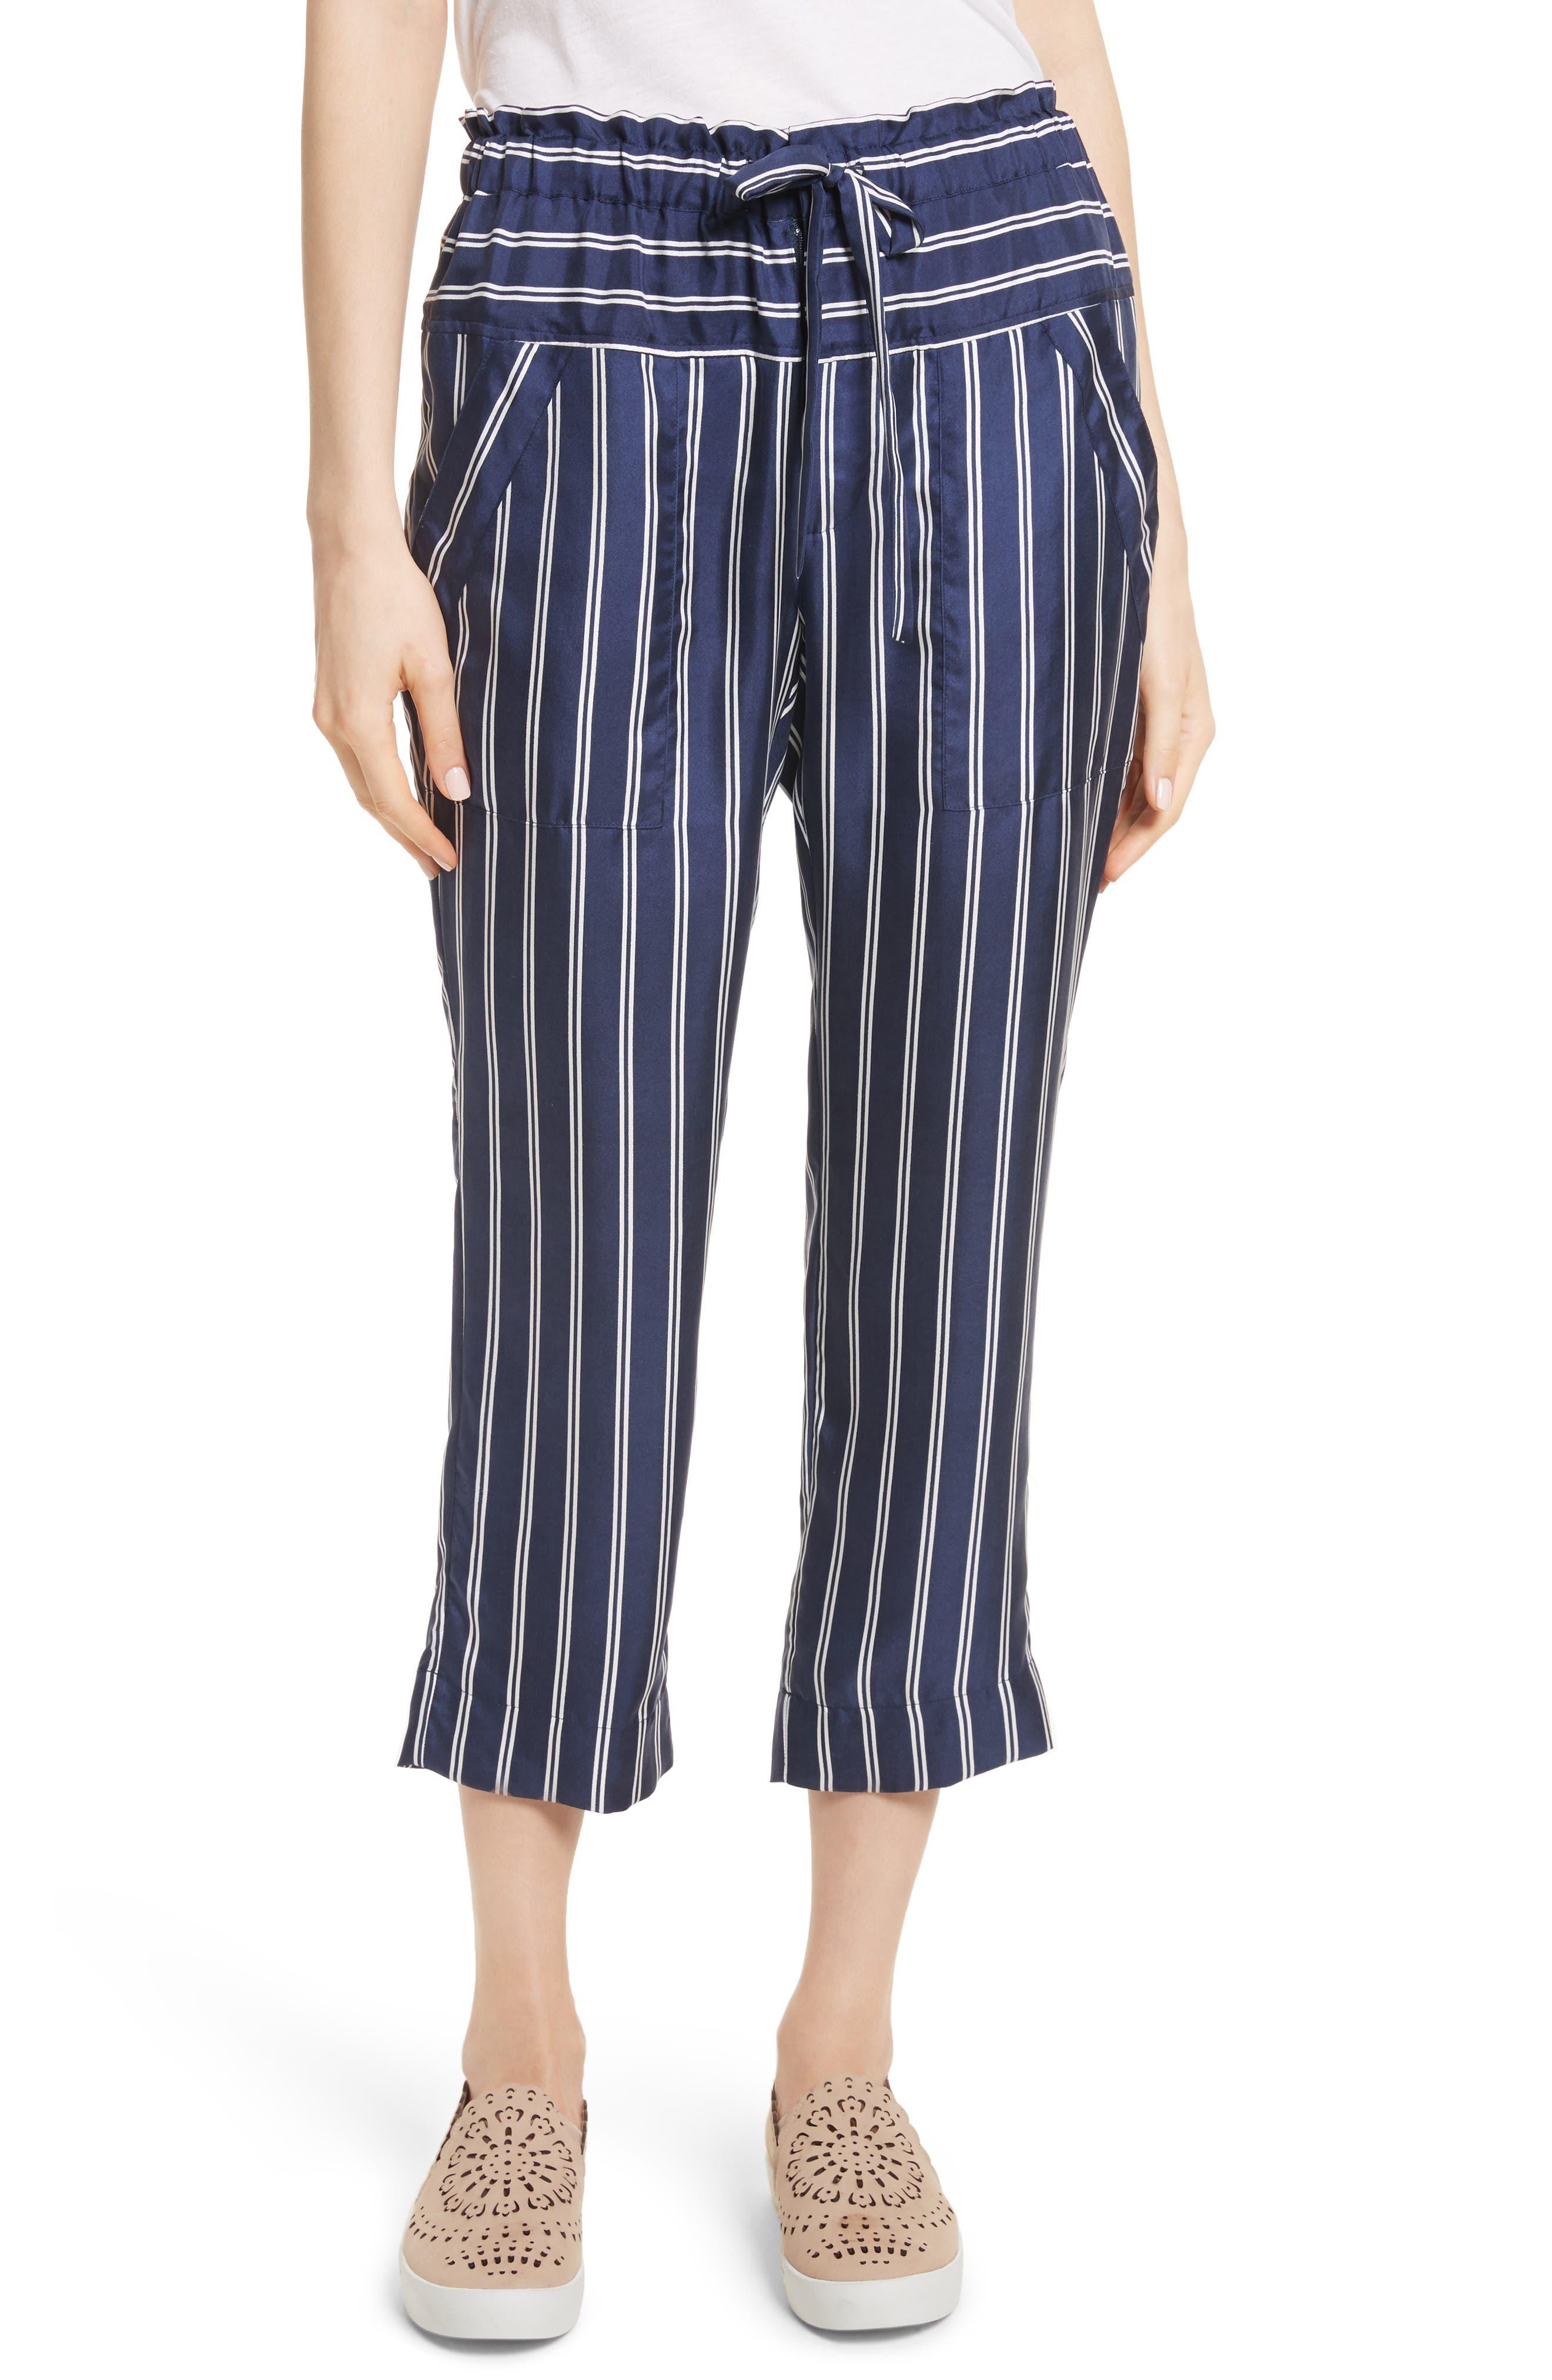 Addiena Stripe Silk Pants,                             Main thumbnail 1, color,                             Dark Navy